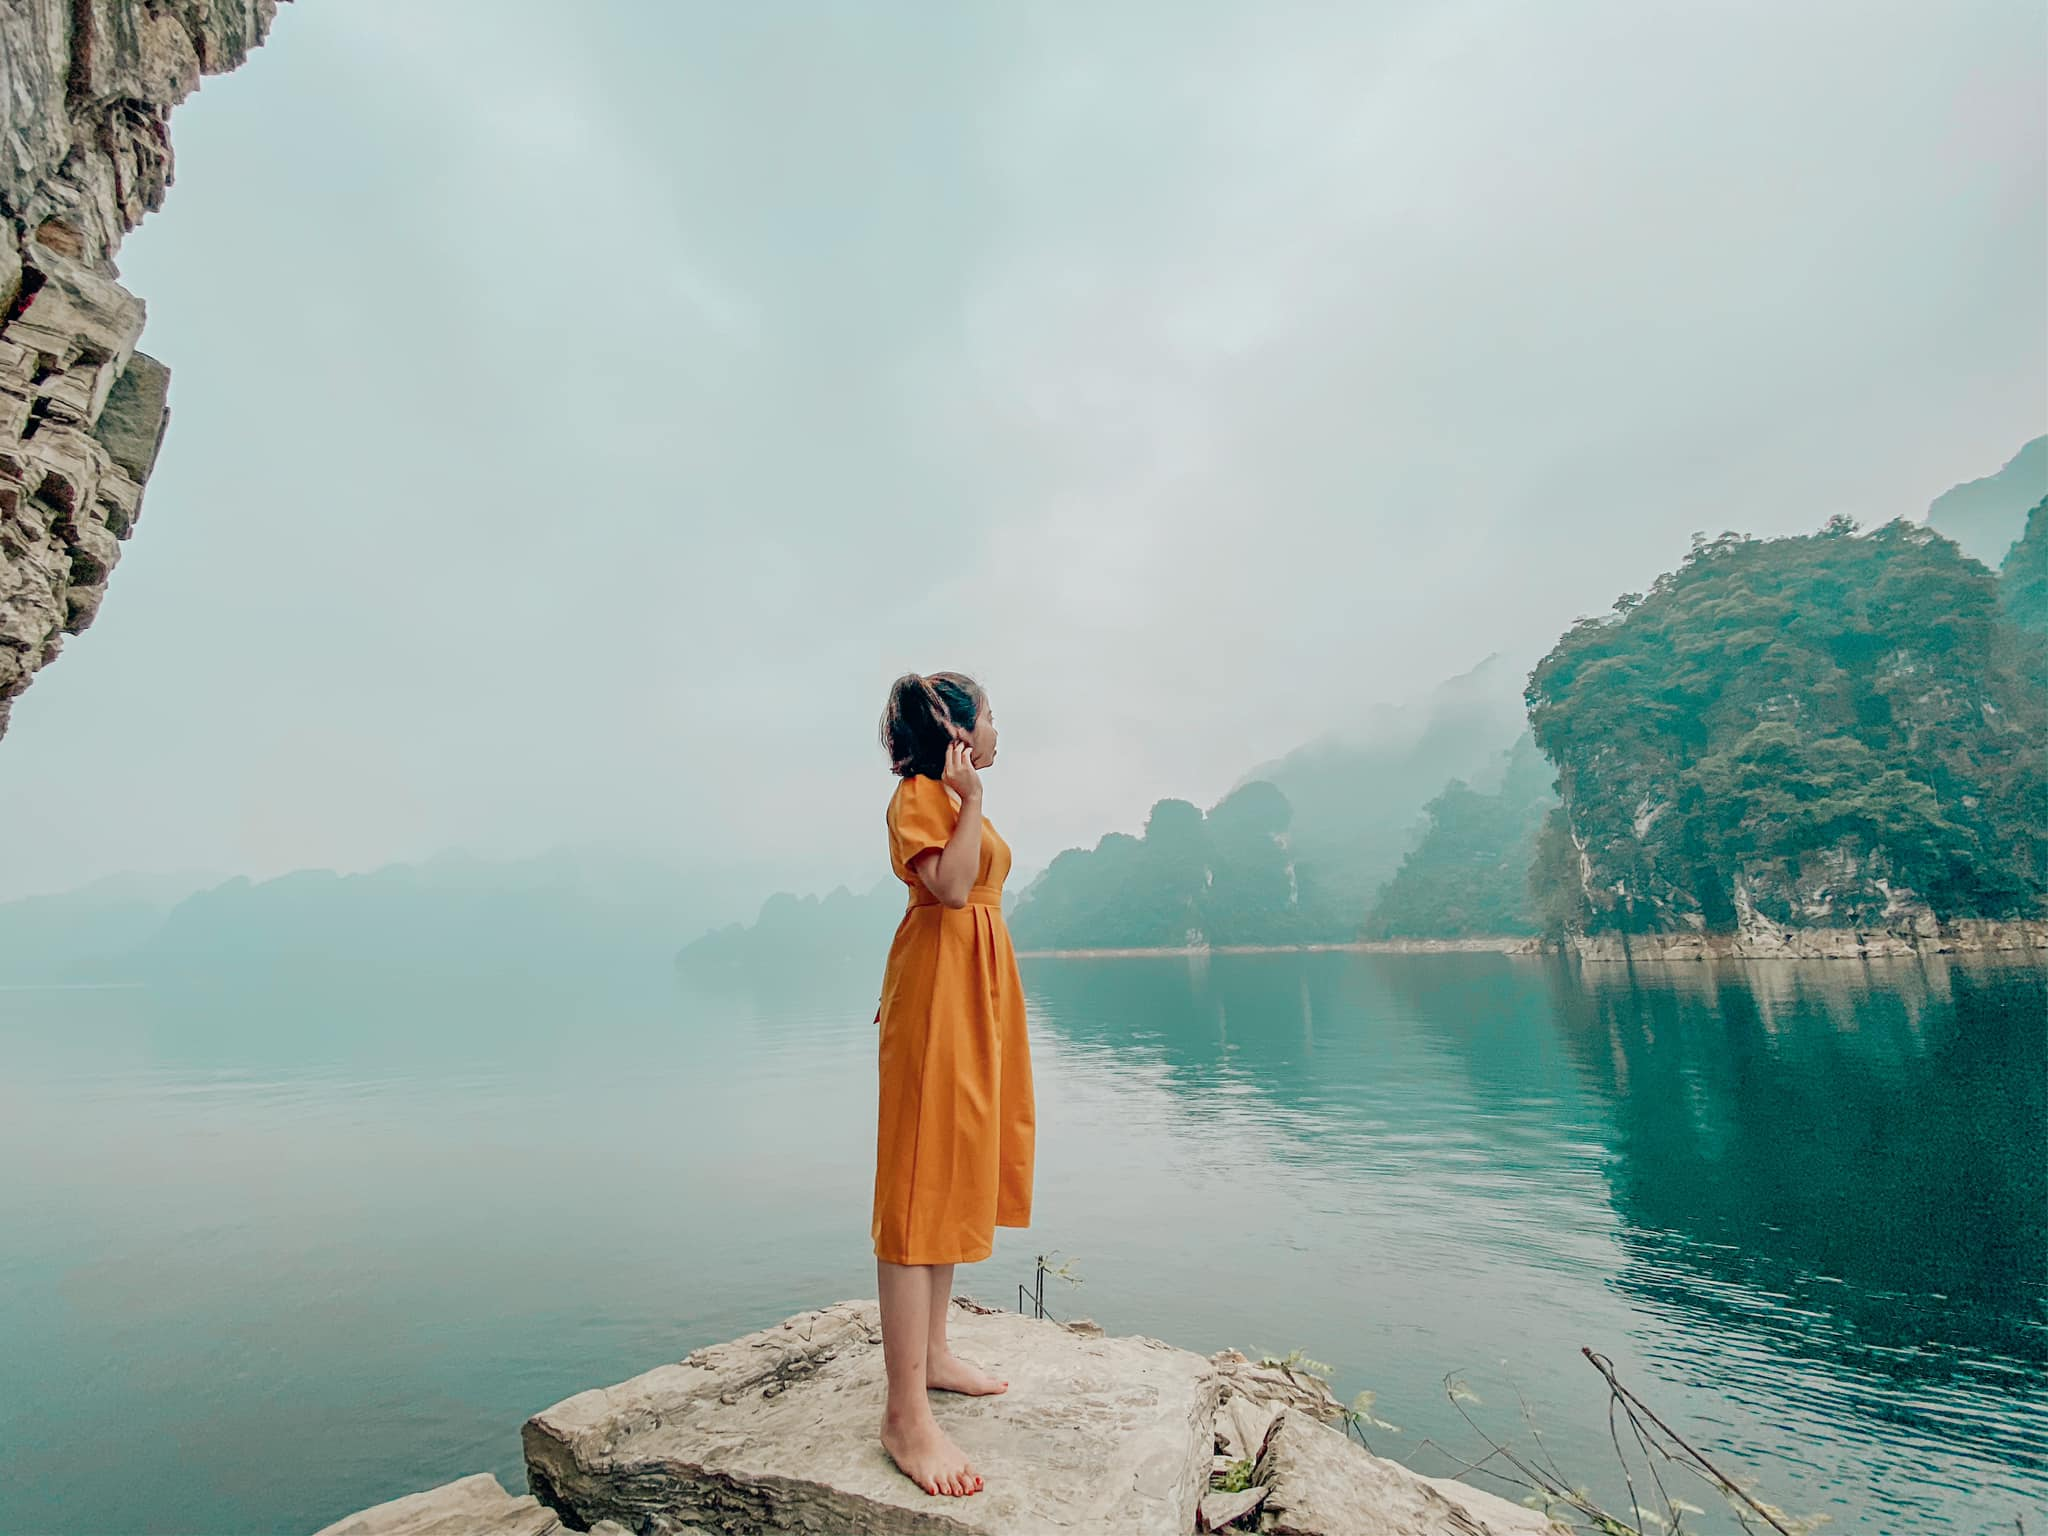 Tong-hop-nhung-dia-diem-du-lich-nui-hot-nhat-trong-dip-30-thang-4-vietmountain-travel16